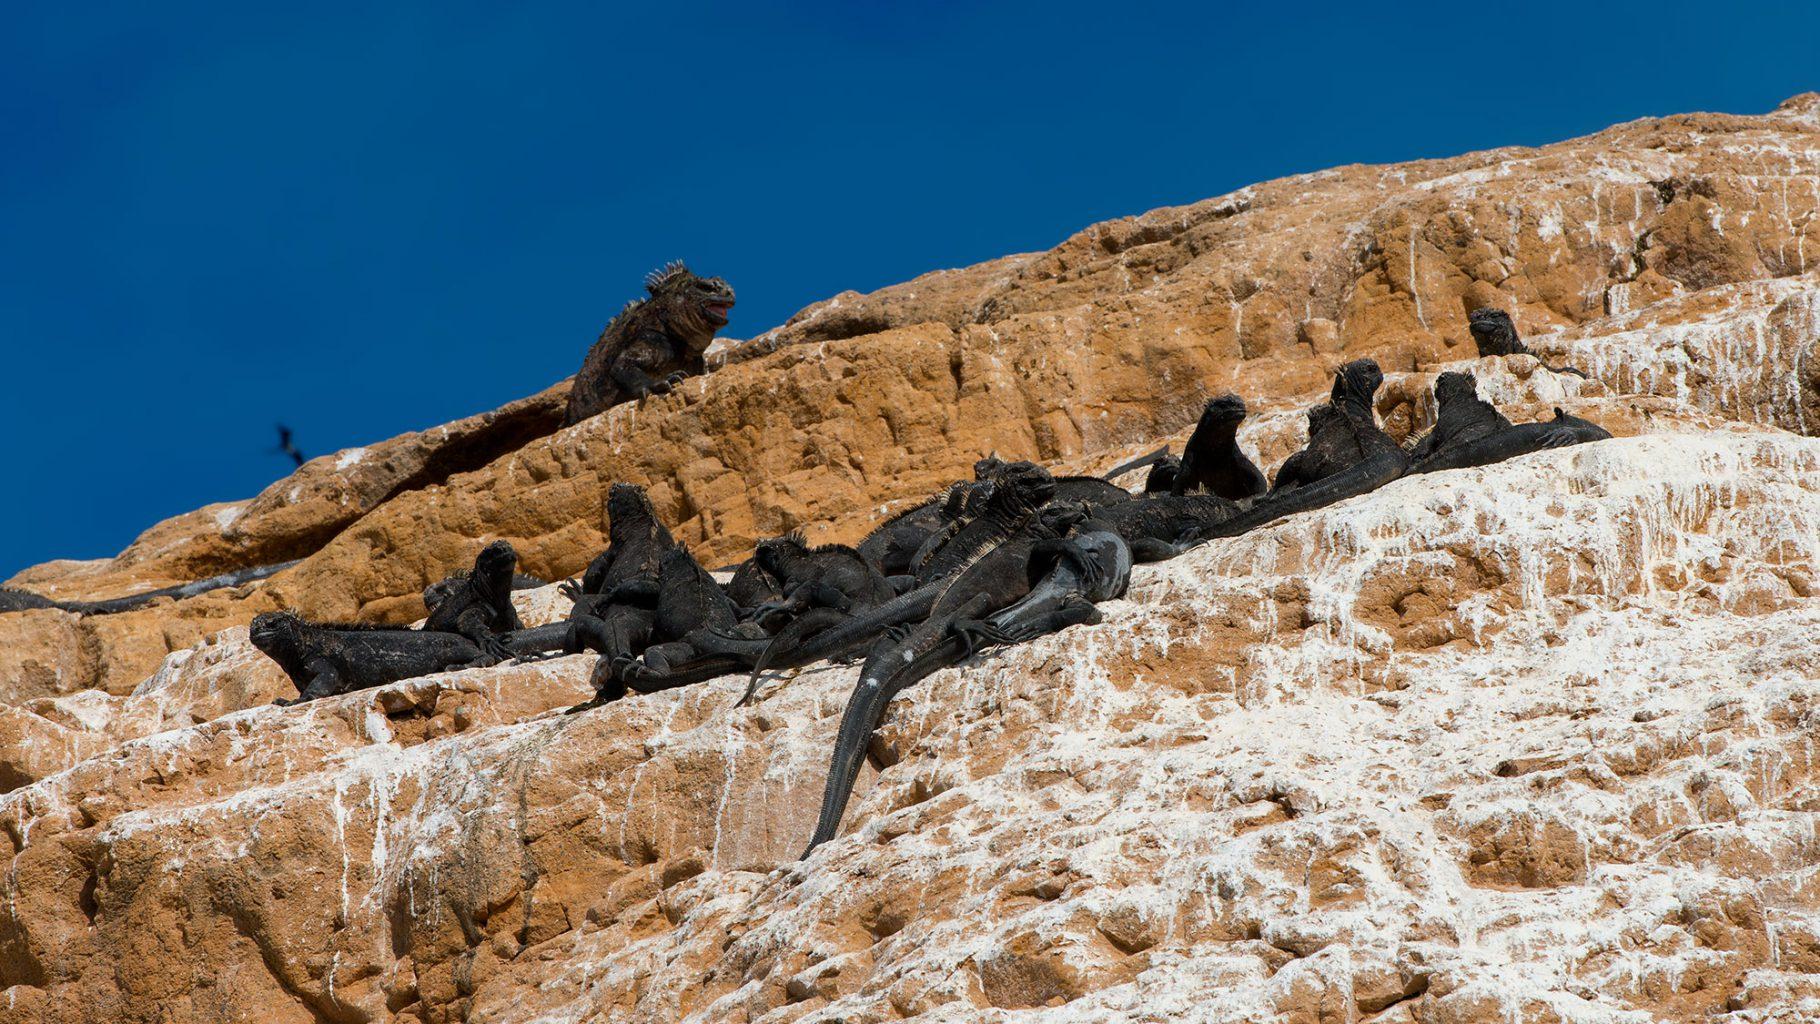 Galapagos Islands - Punta Vicente Roca Black Iguanas, Schwarze Leguane